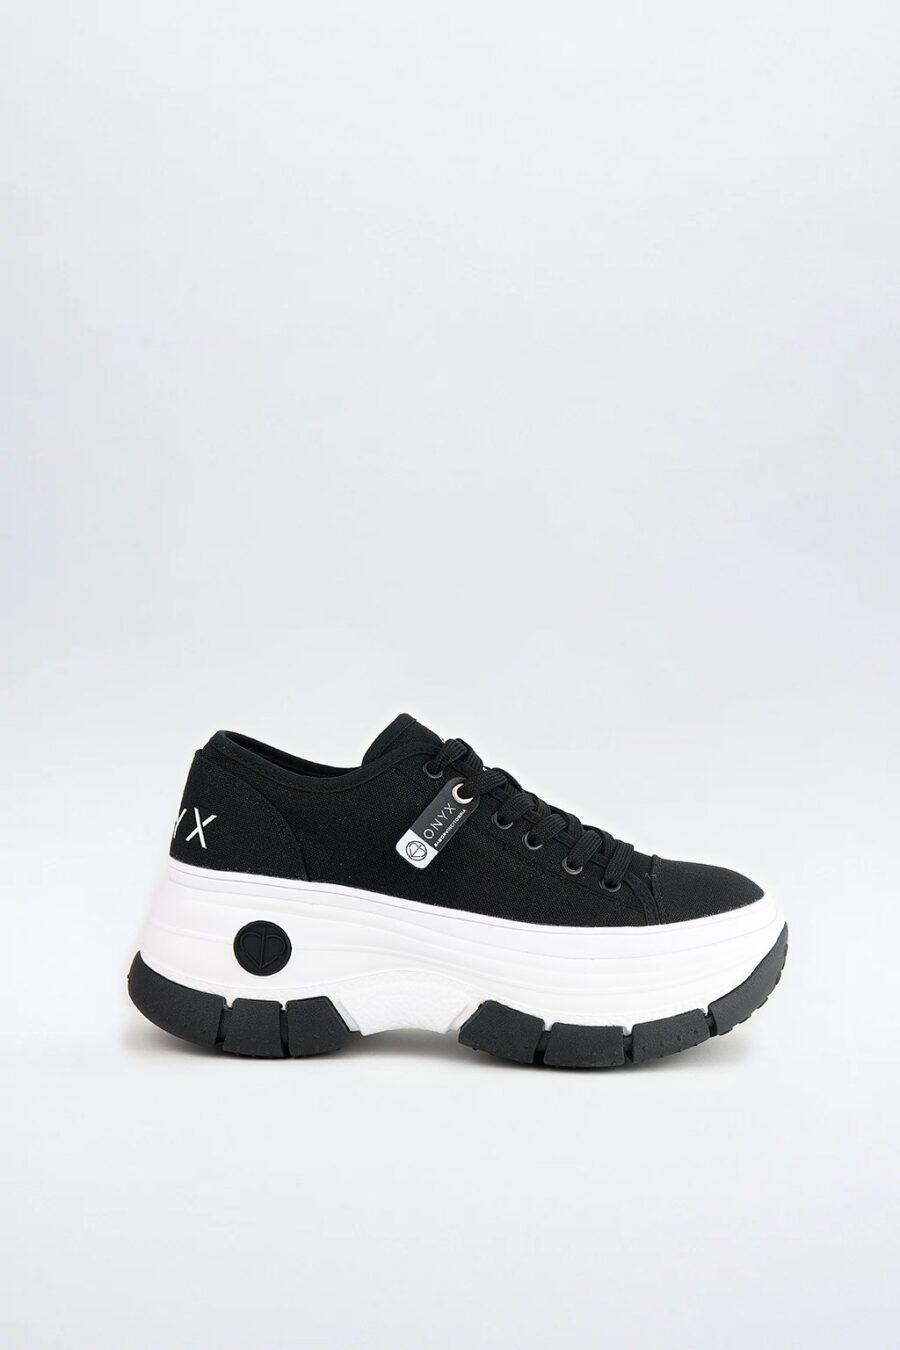 OX 010 Black